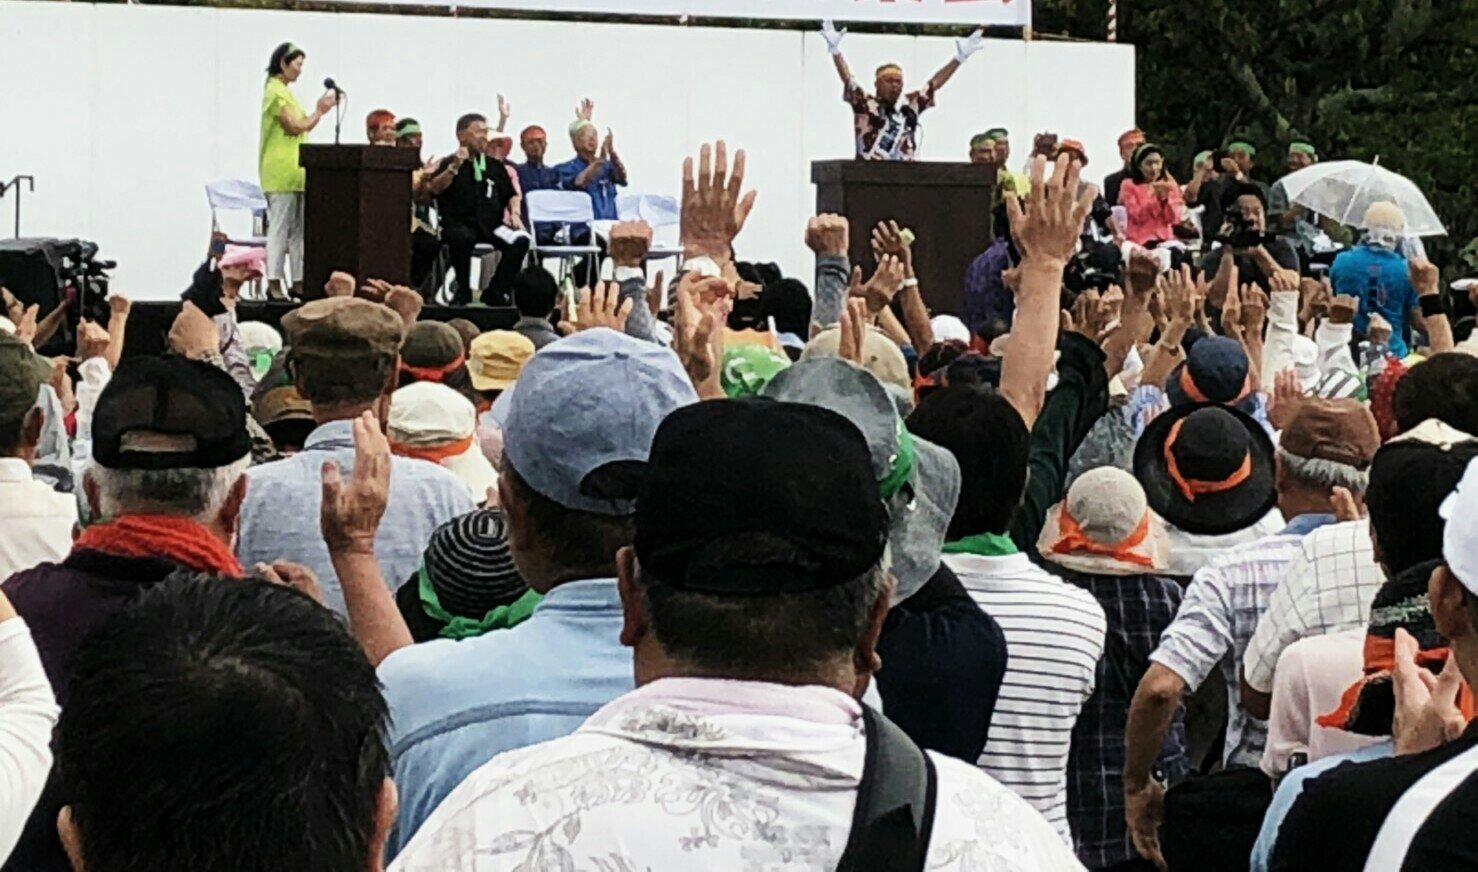 沖縄県知事選挙への支援行動4